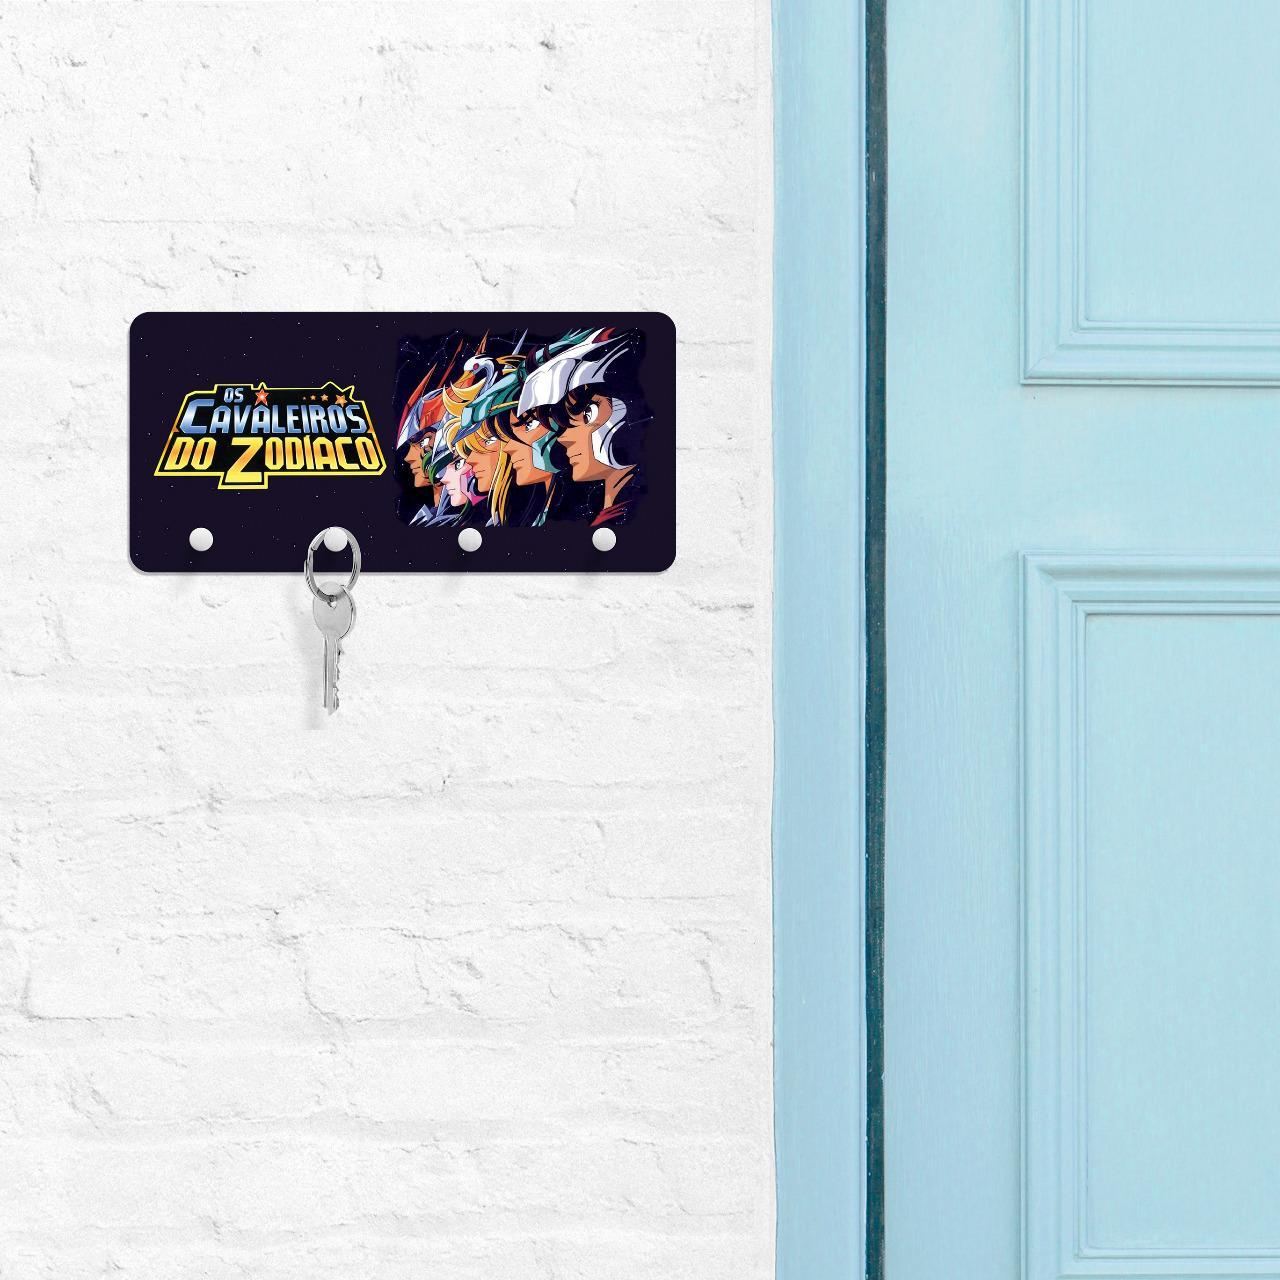 Porta Chave: Os Cavaleiros dos Zodíacos